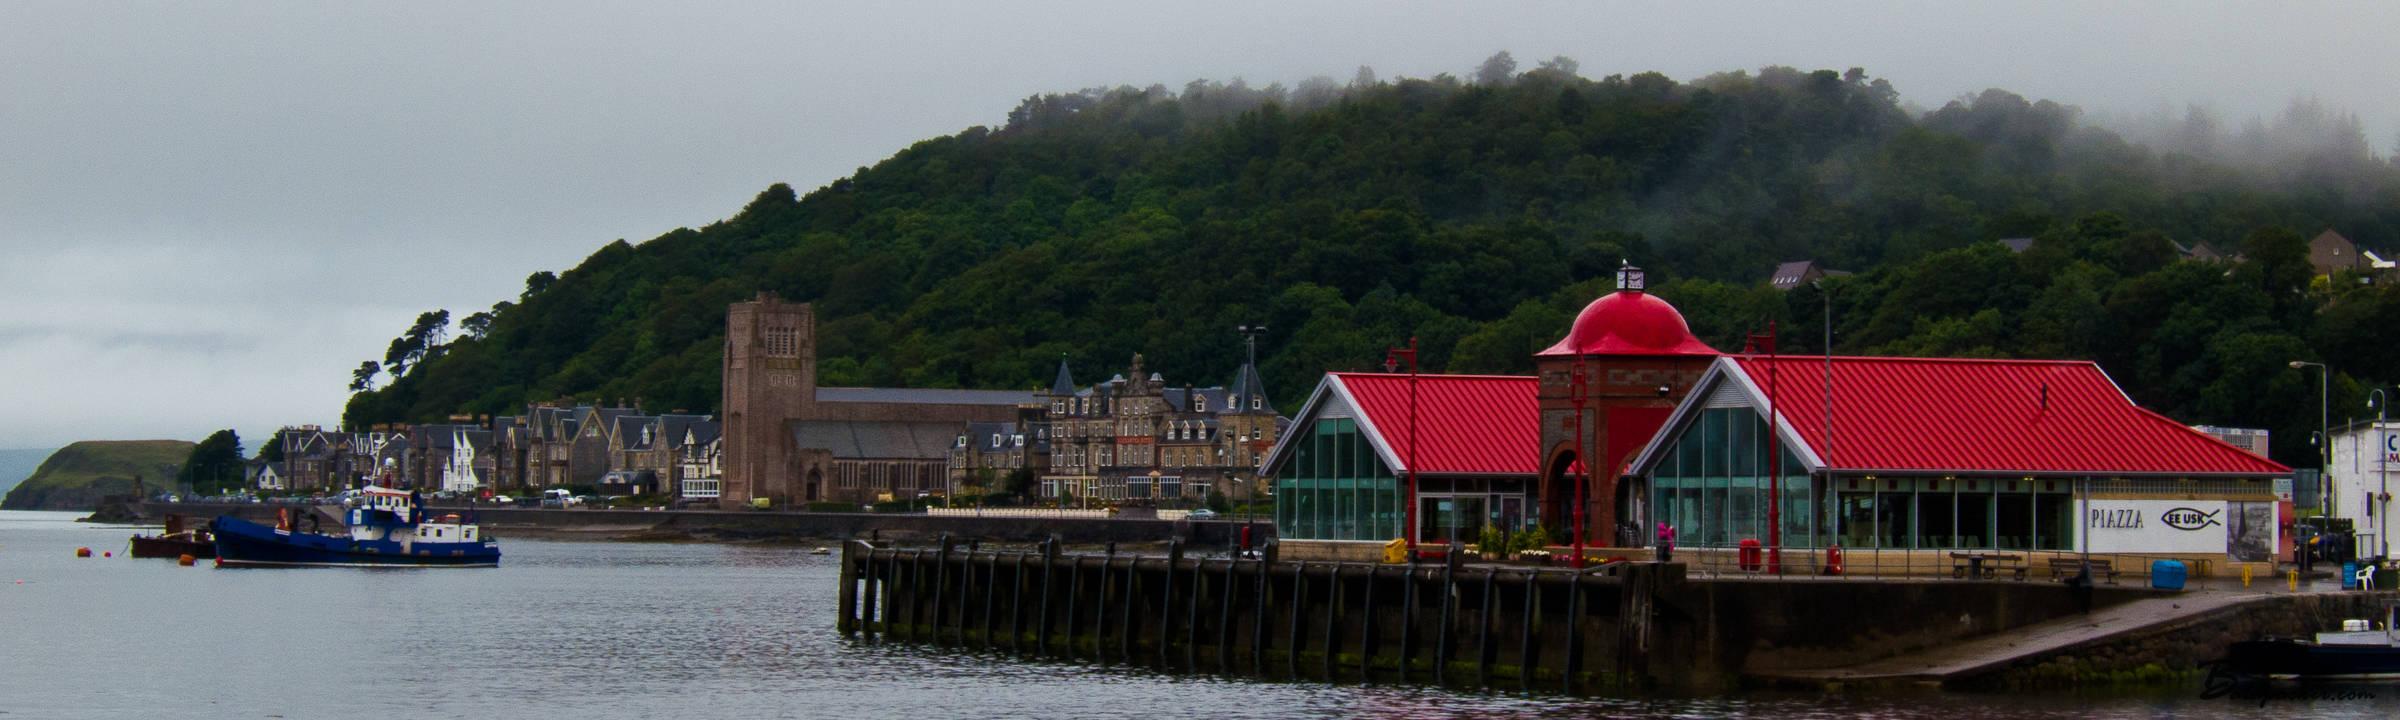 Scotland: Oban